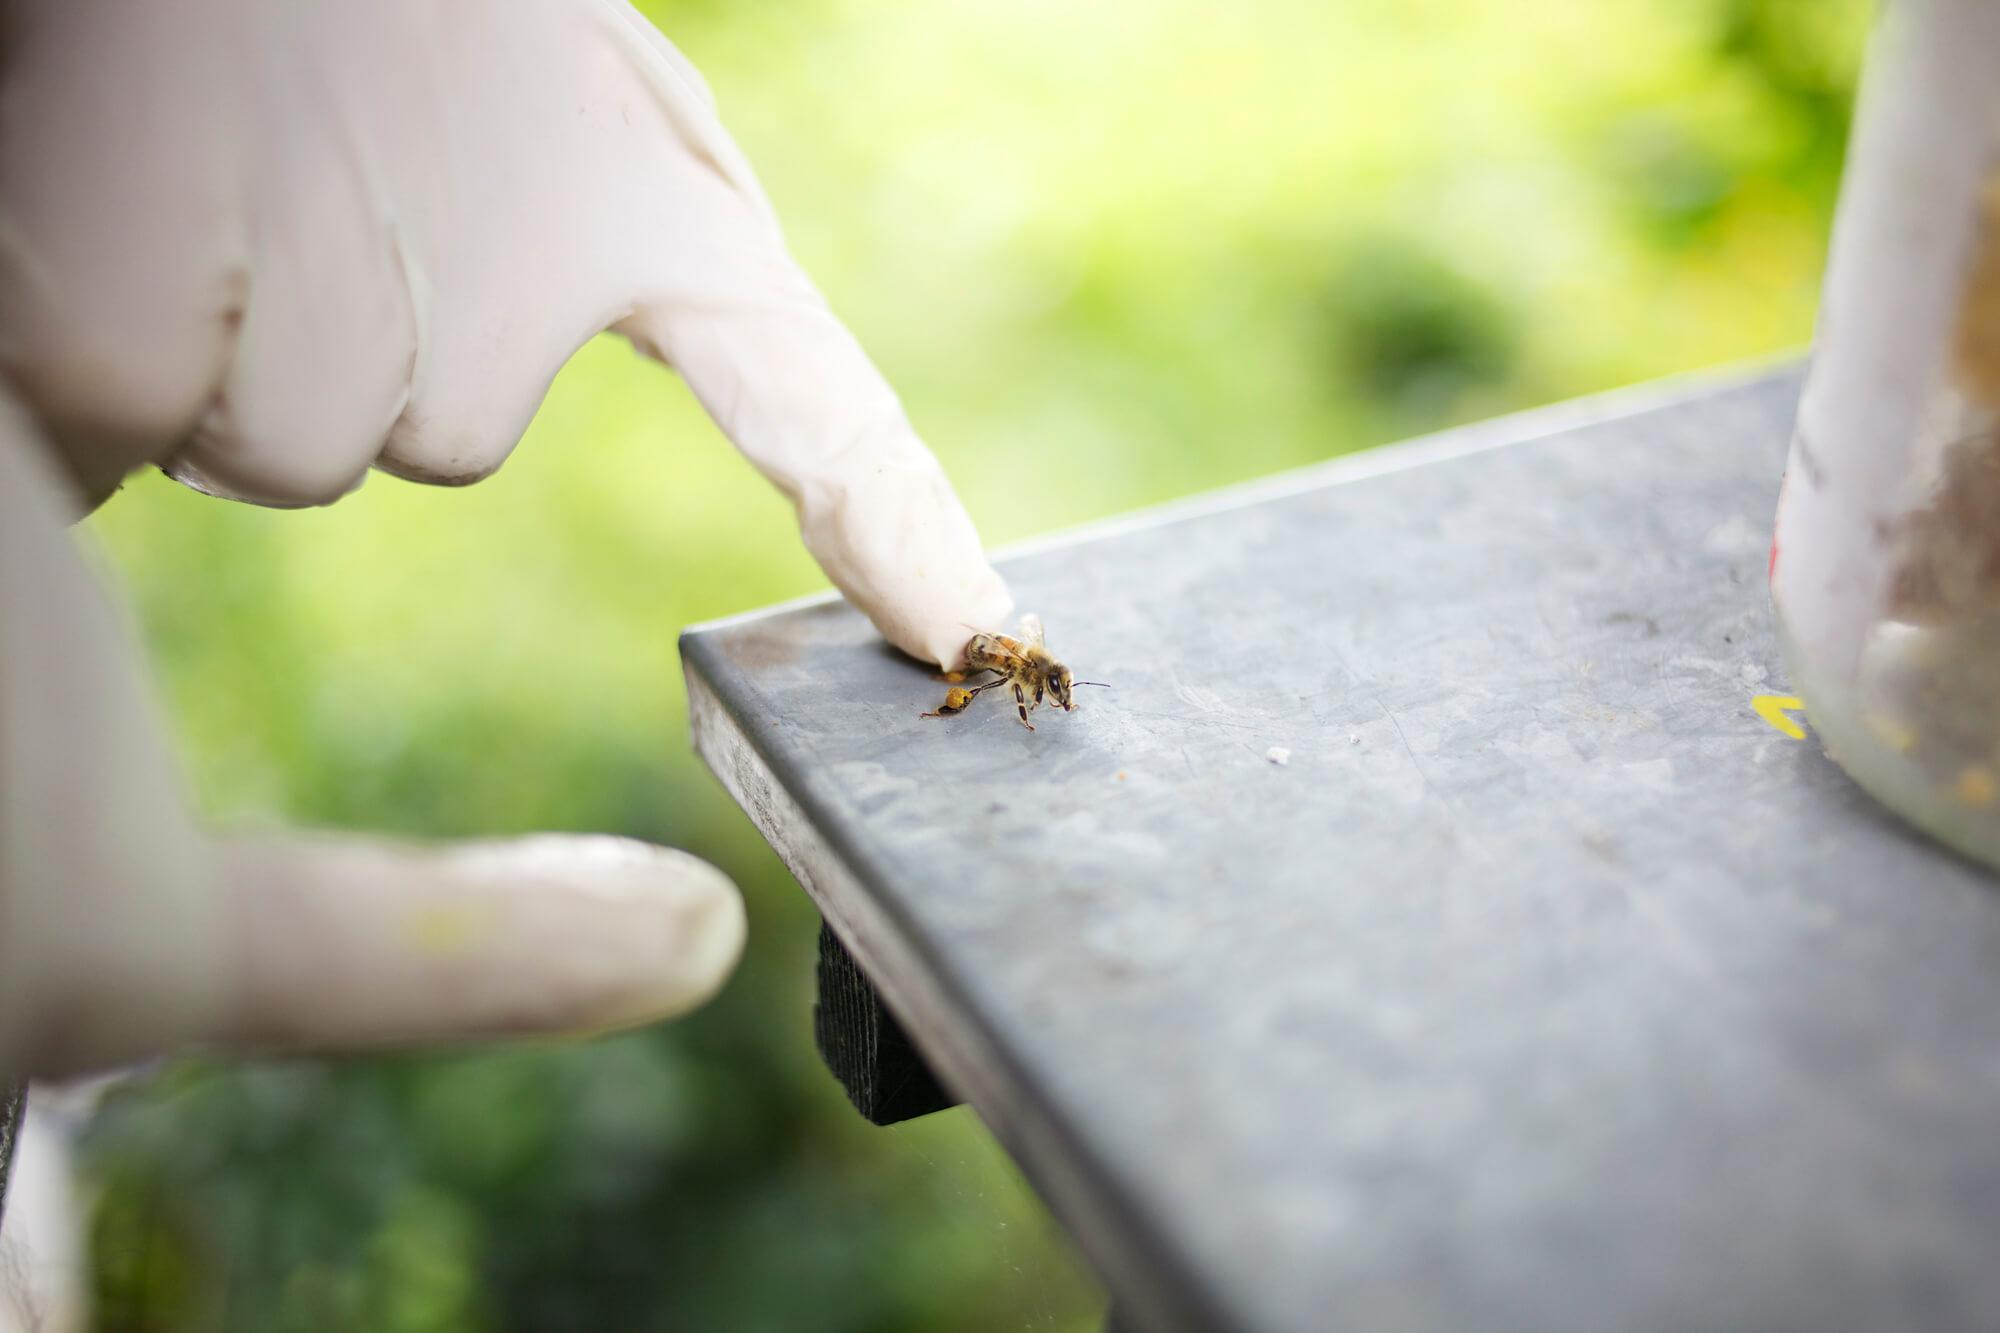 bees-camilla-goddard-katie-hyams-reportage-06_d.jpg